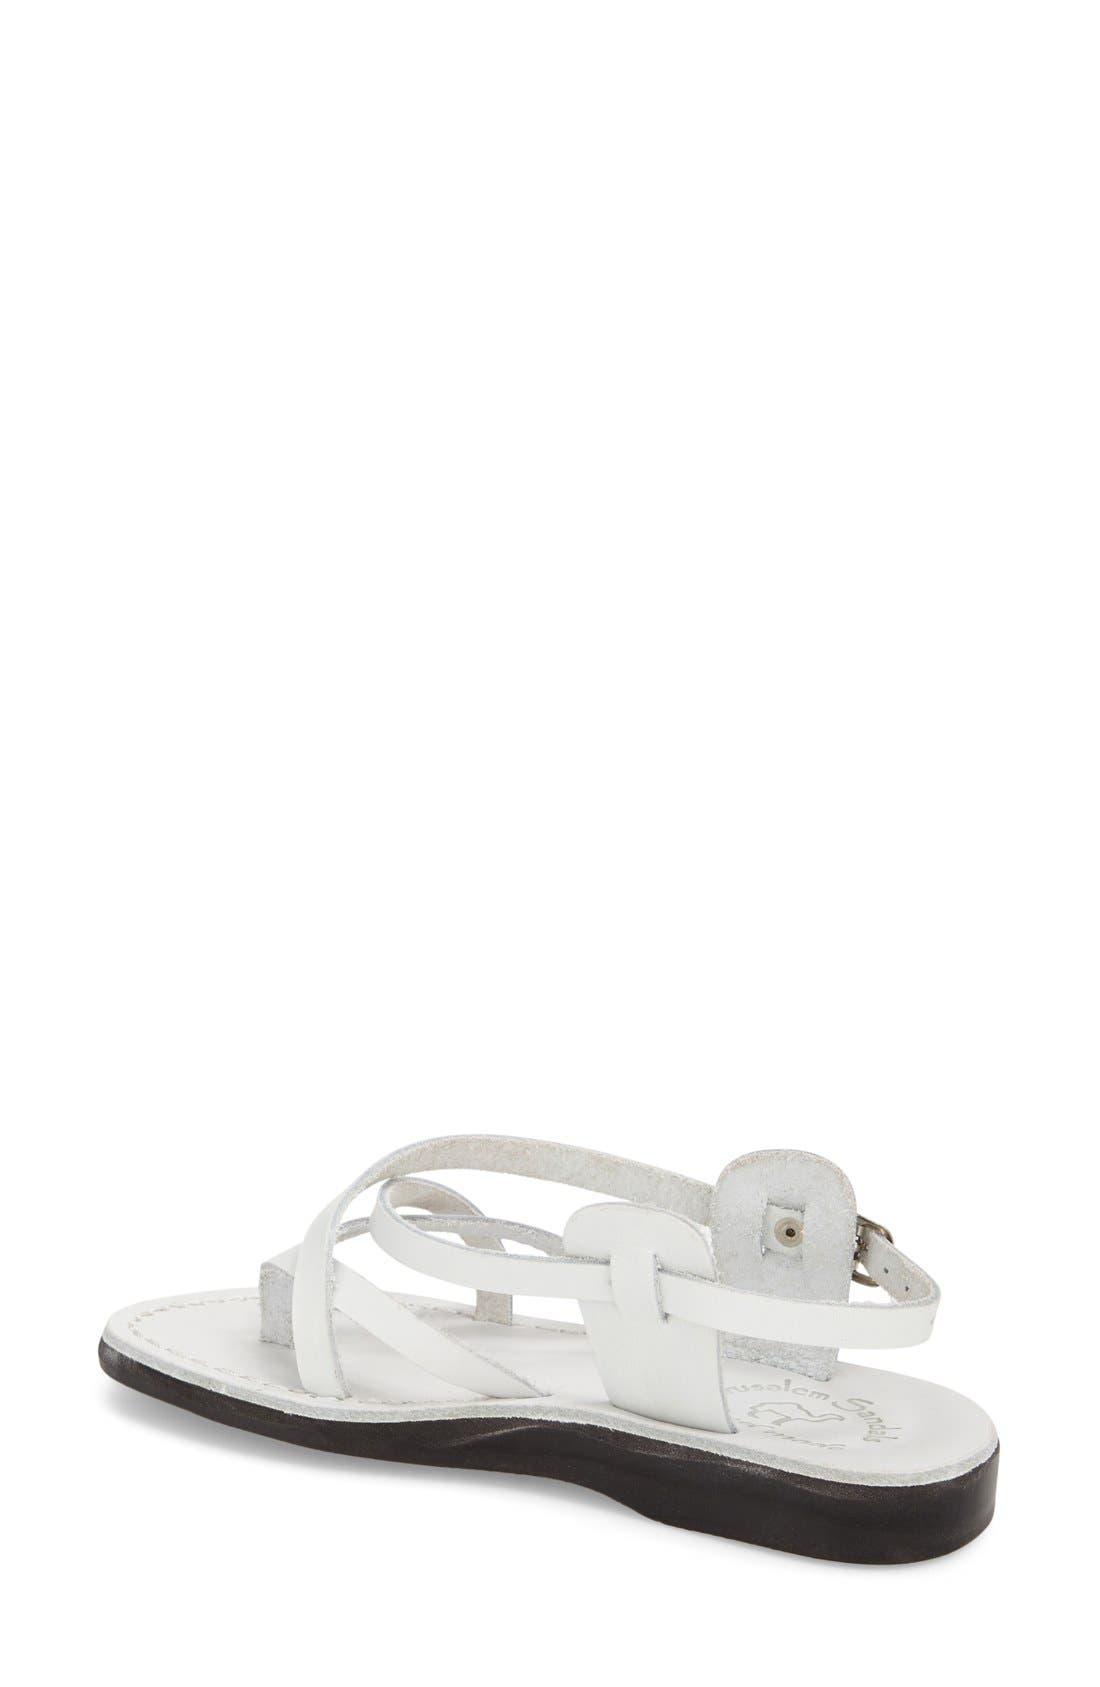 'Tamar' Strappy Sandal,                             Alternate thumbnail 2, color,                             White Leather